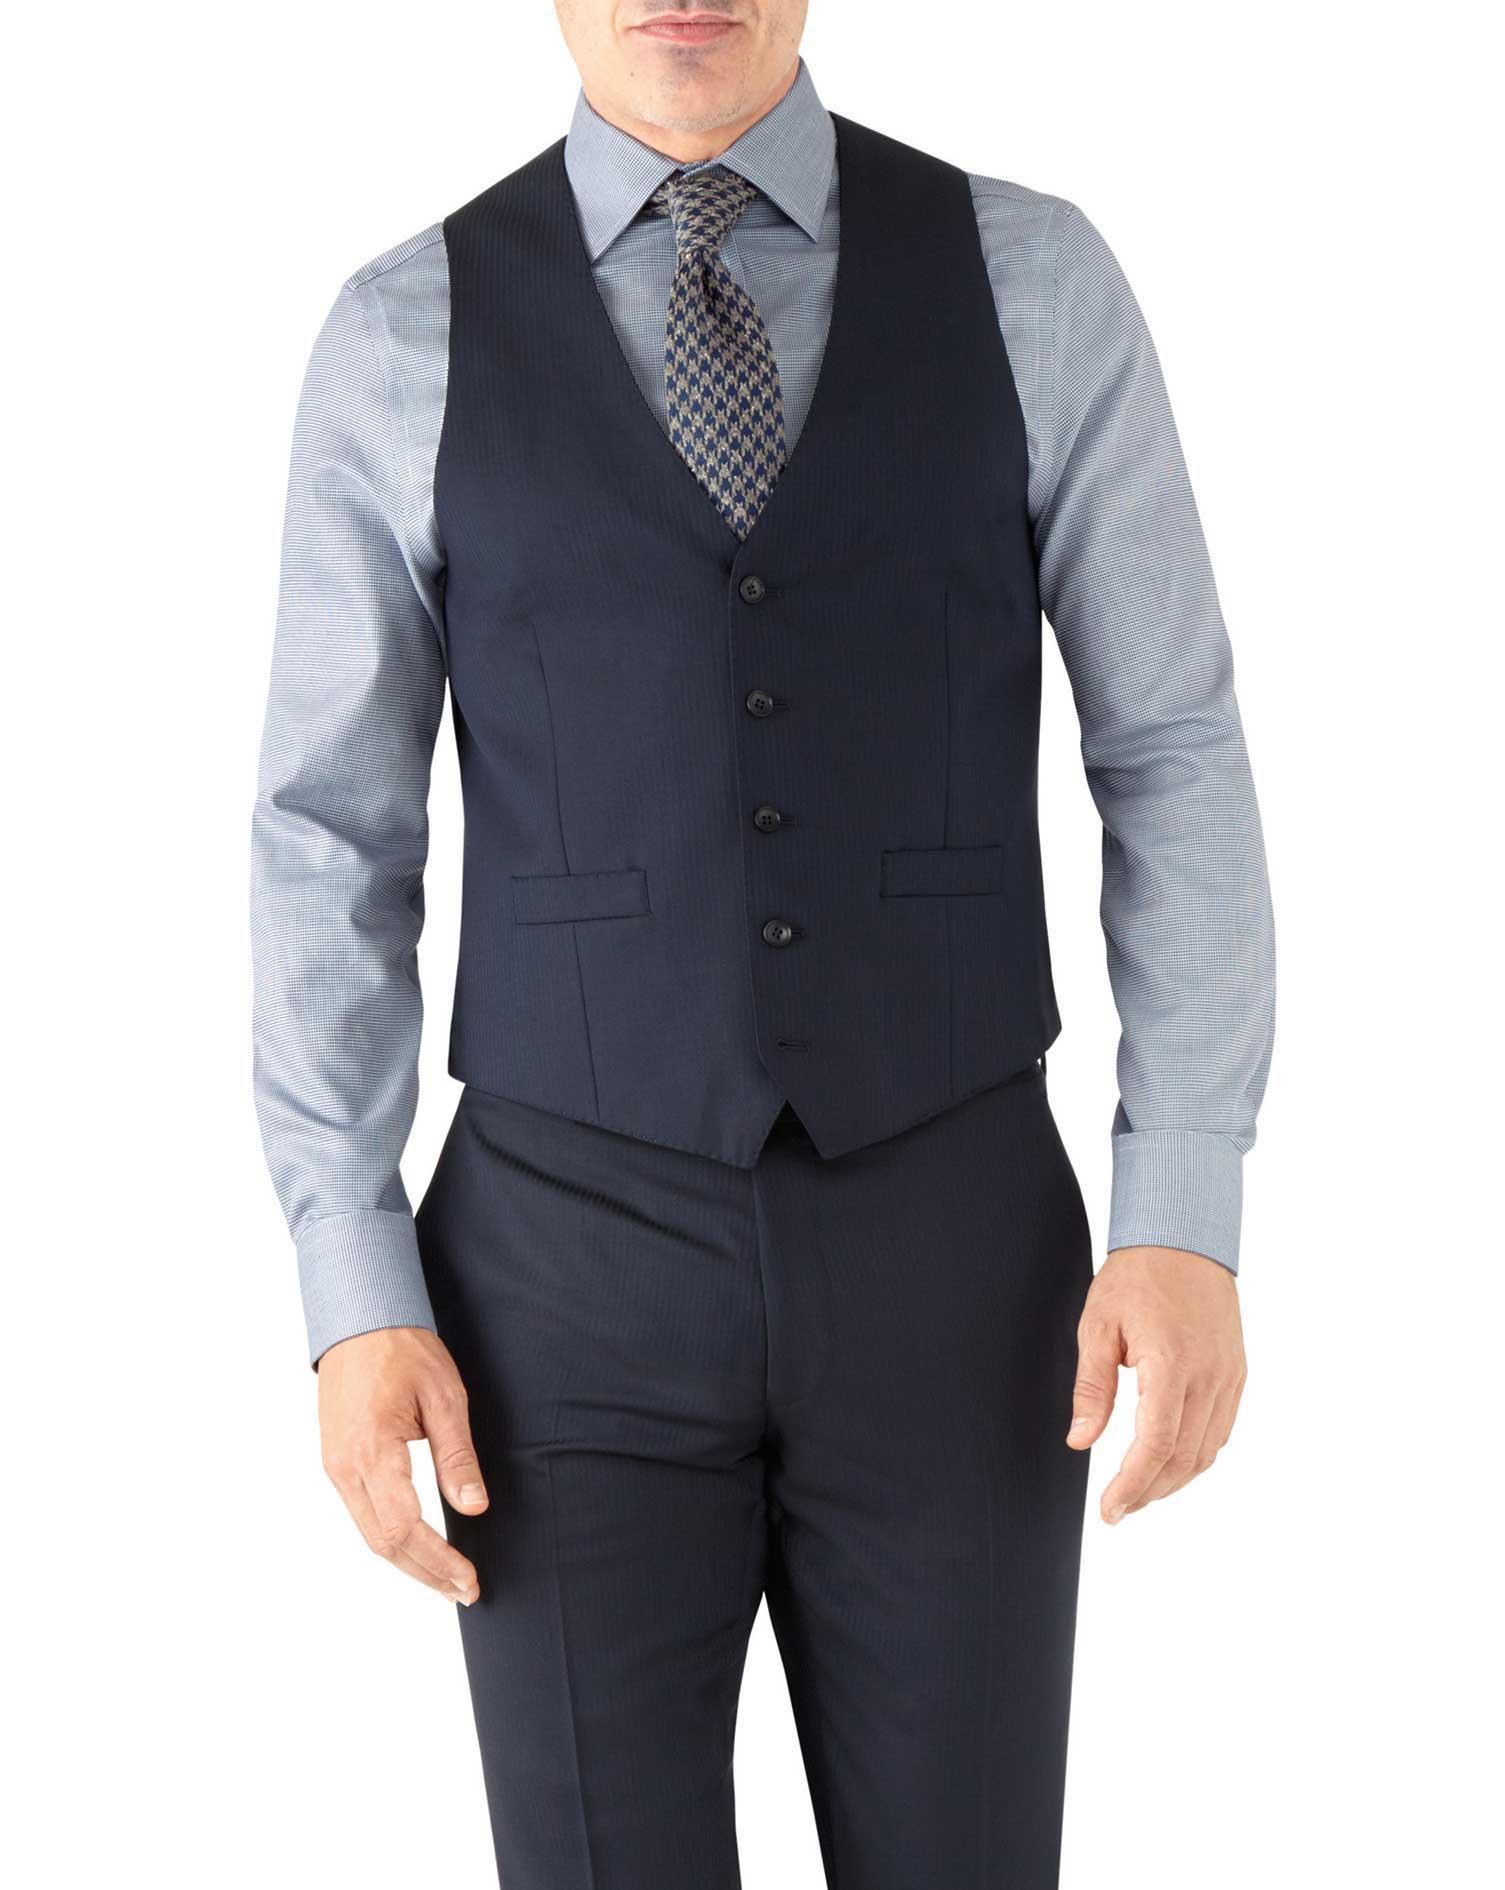 Navy Herringbone Adjustable Fit Italian Suit Wool Waistcoat Size w46 by Charles Tyrwhitt